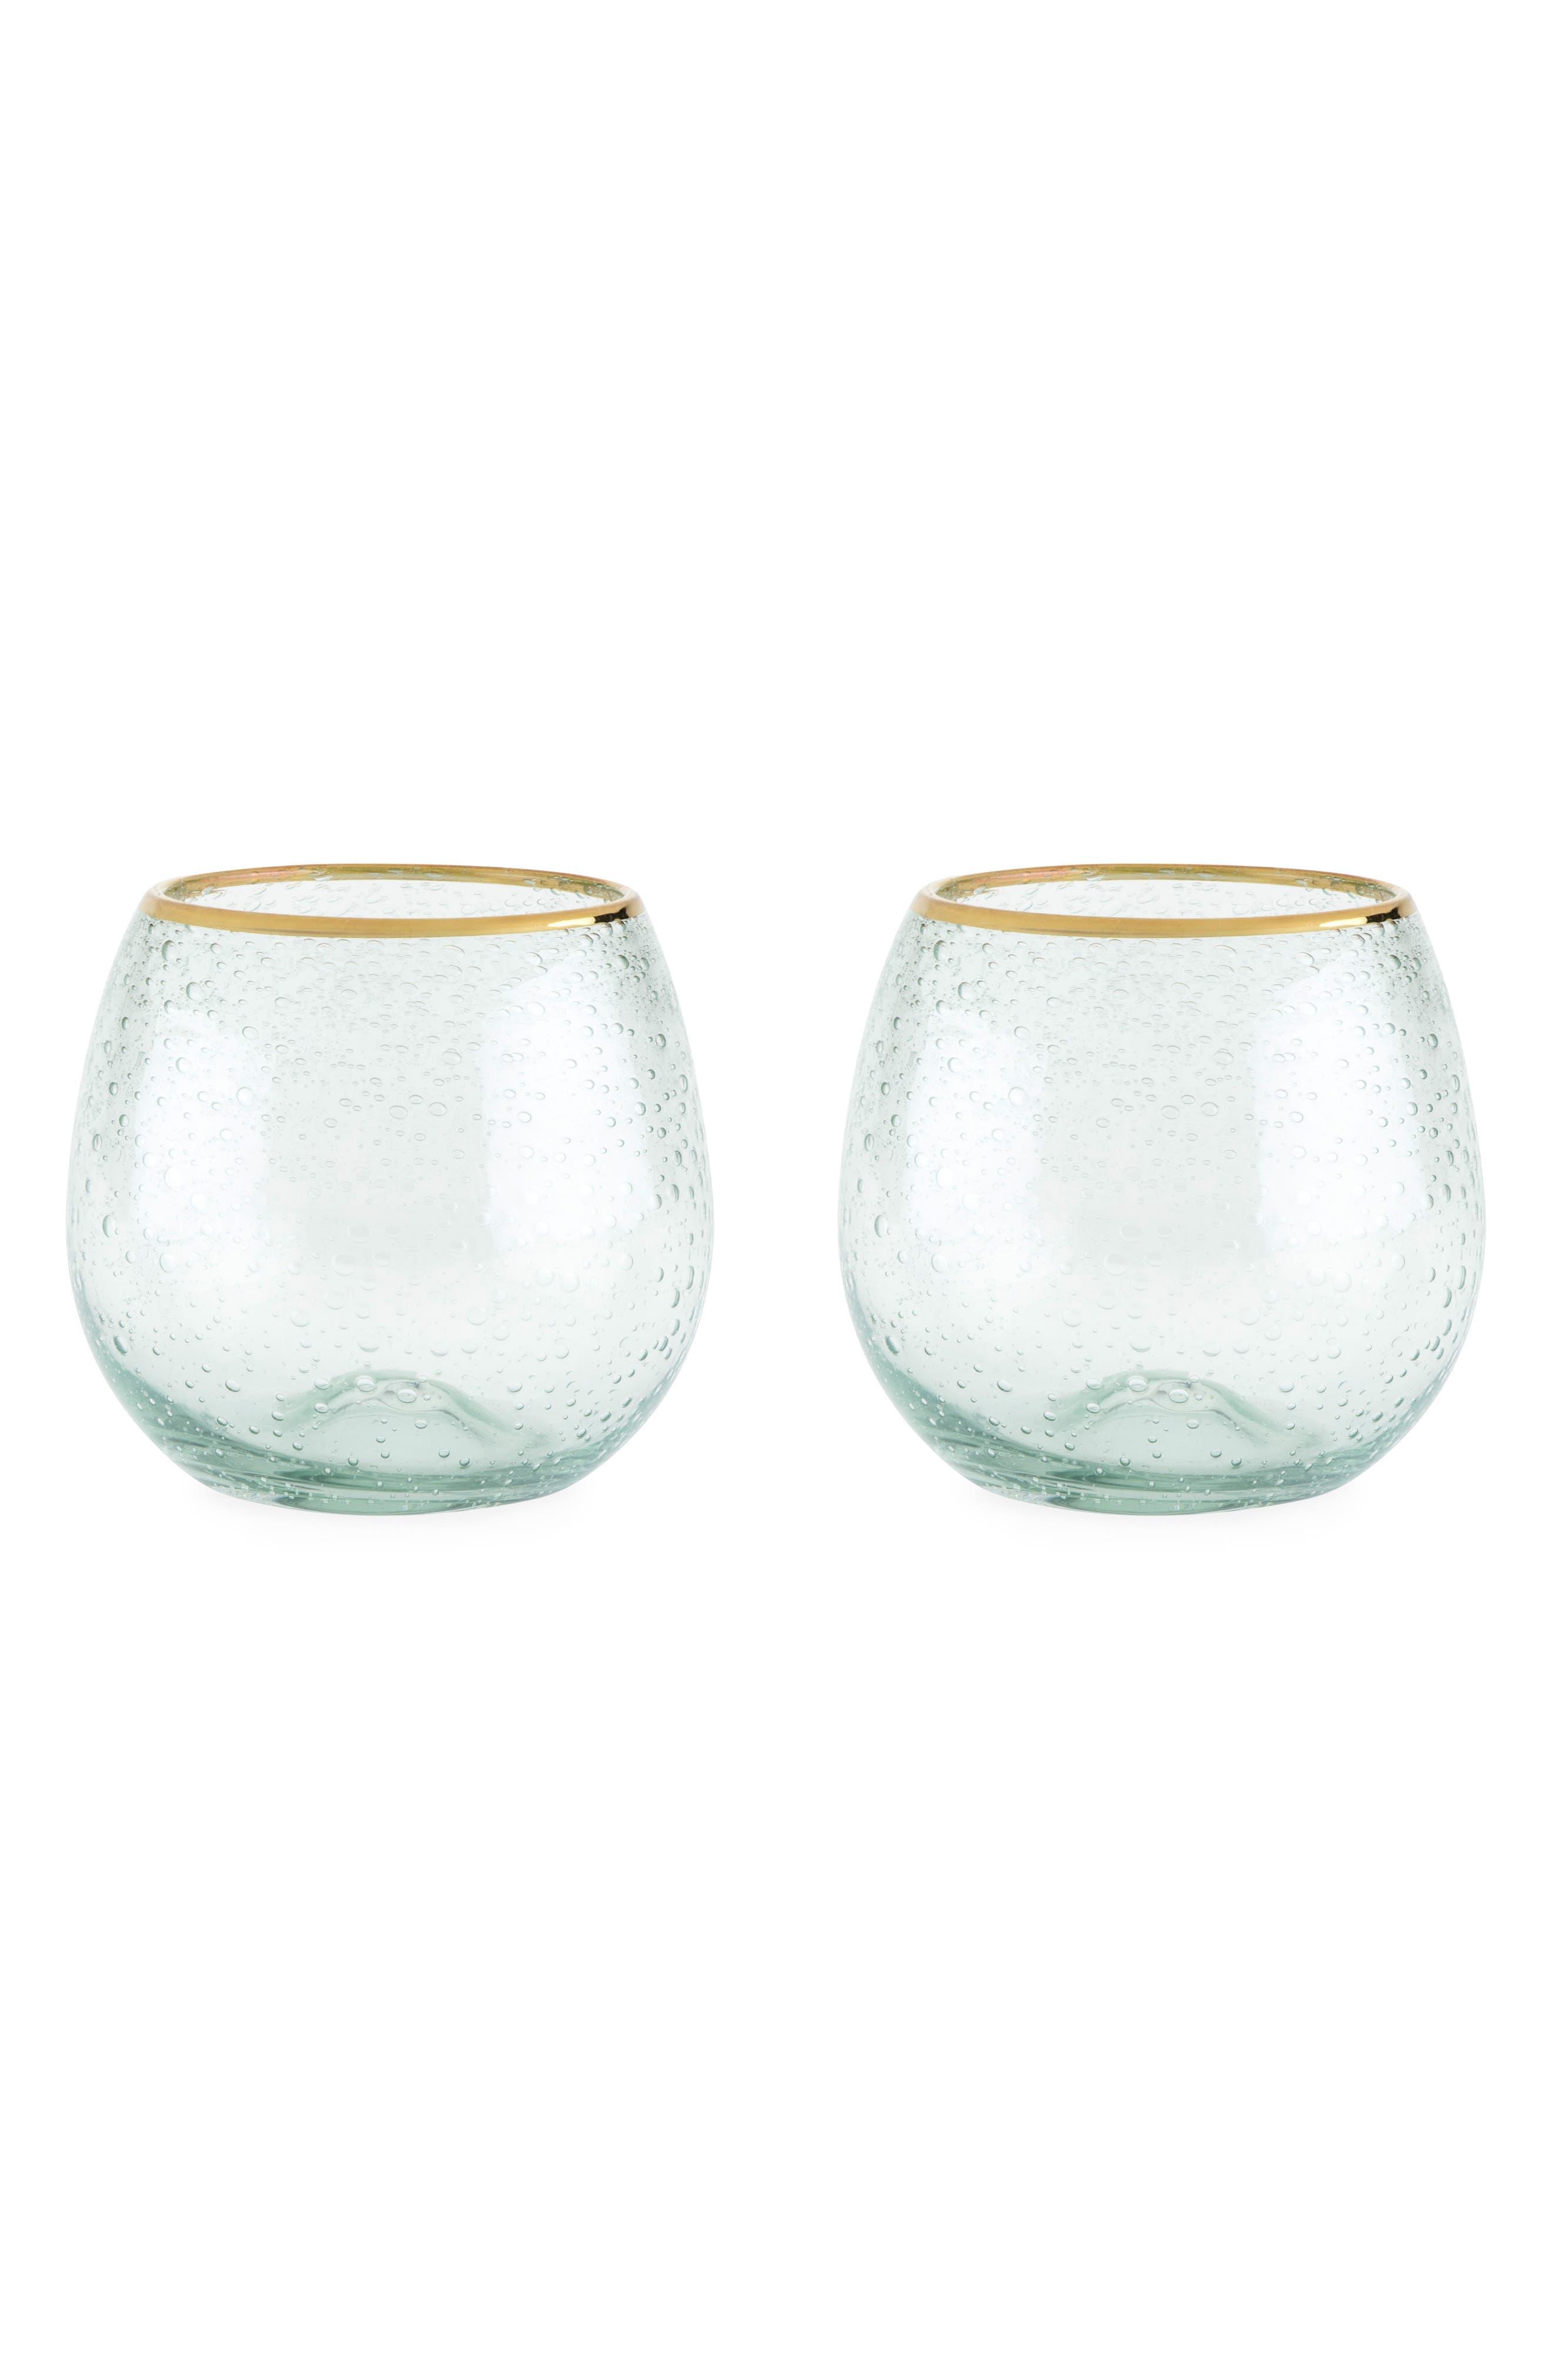 Main Image - TWINE Set of 2 Gold Rim Stemless Wine Glasses